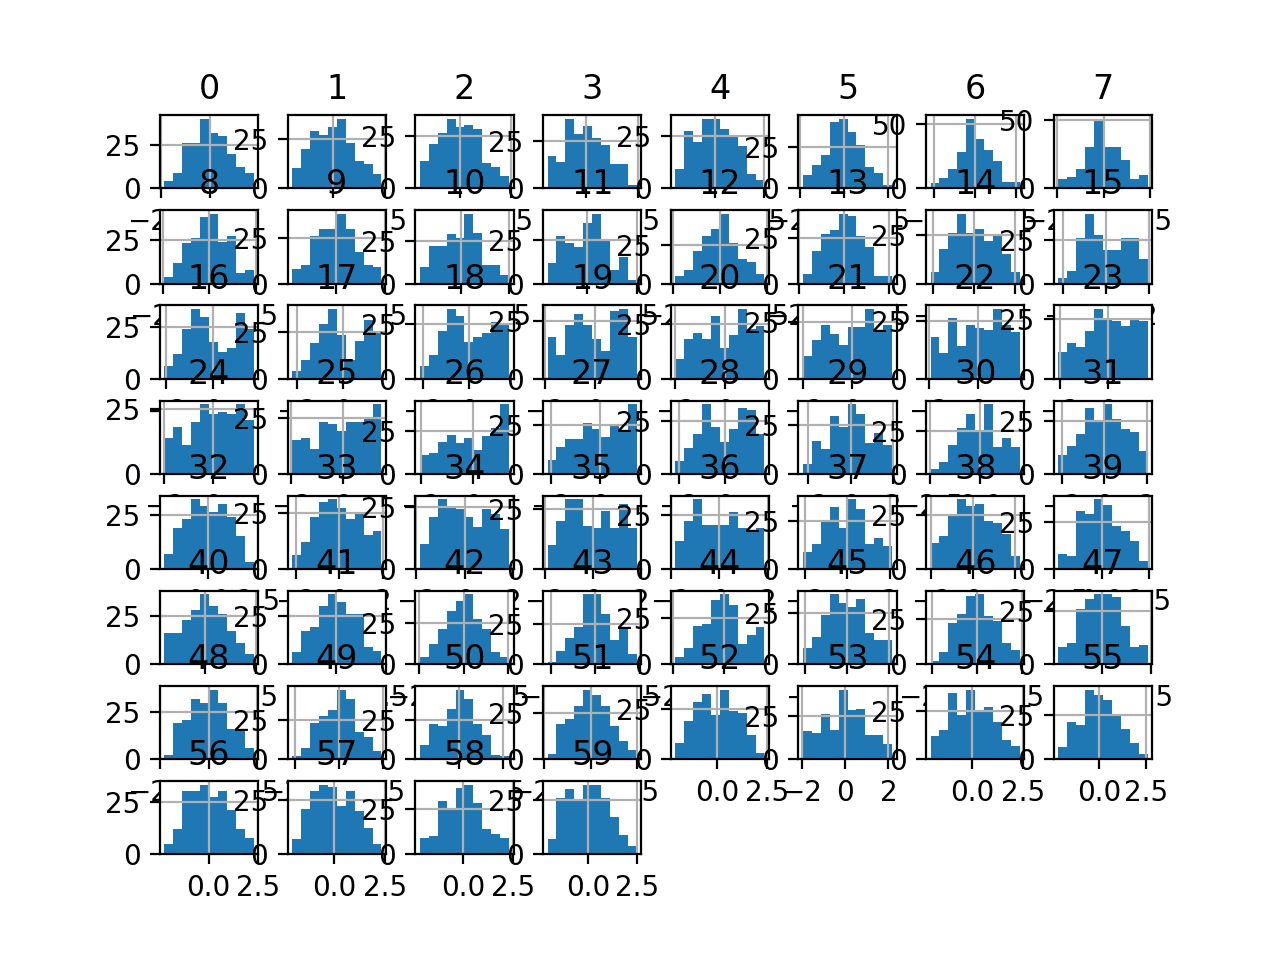 Histogram Plots of Box-Cox Transformed Input Variables for the Sonar Dataset